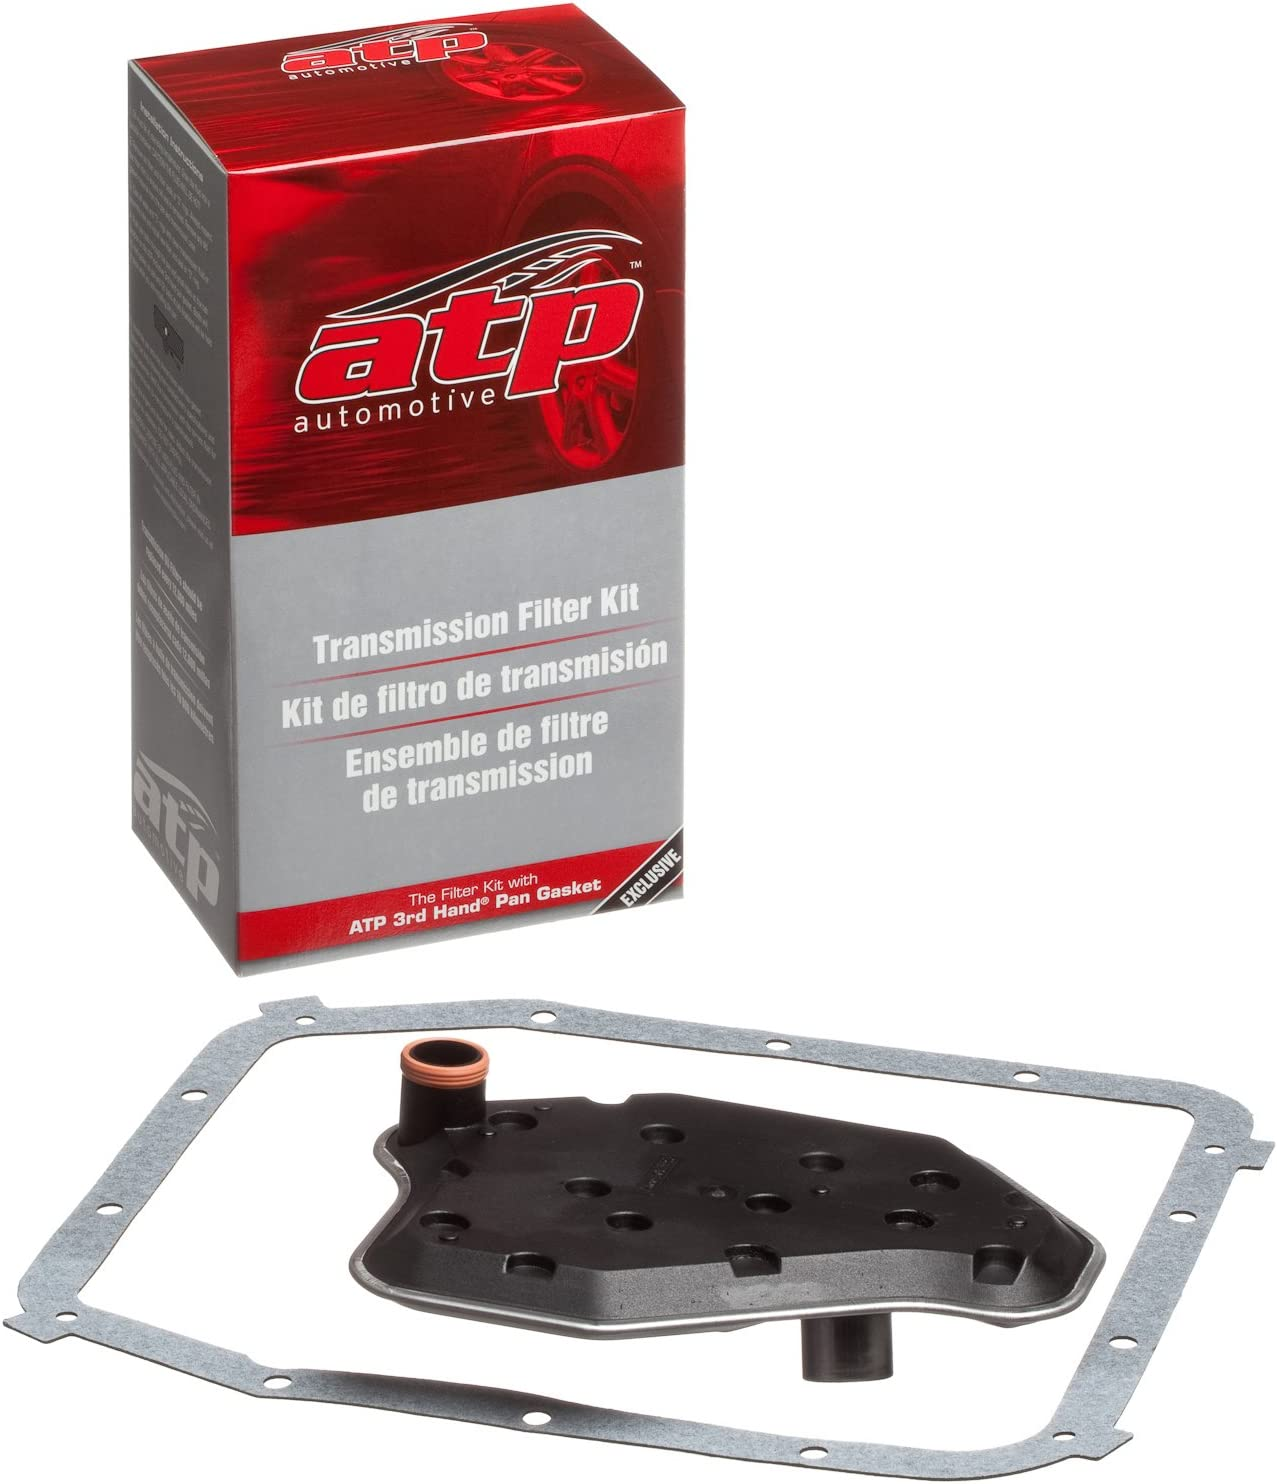 Auto Trans Filter Kit-Transmission Filter Wix 58955